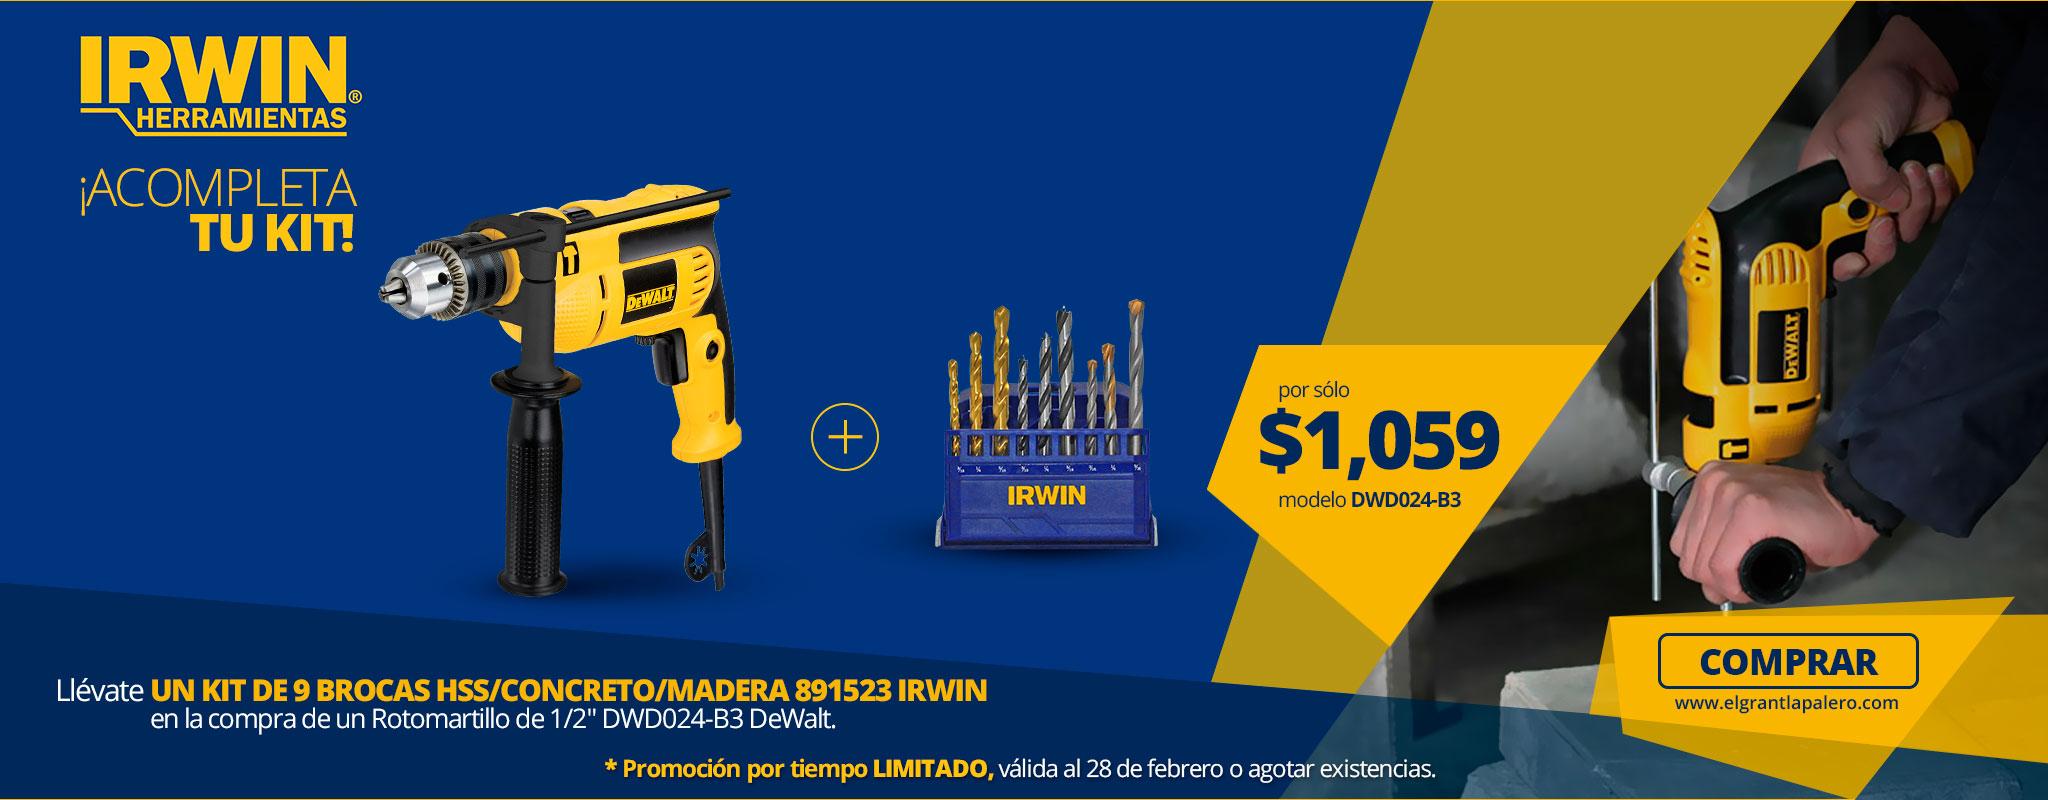 IRWIN te Regala 1 kit de brocas en la compra de DWD024-B3!